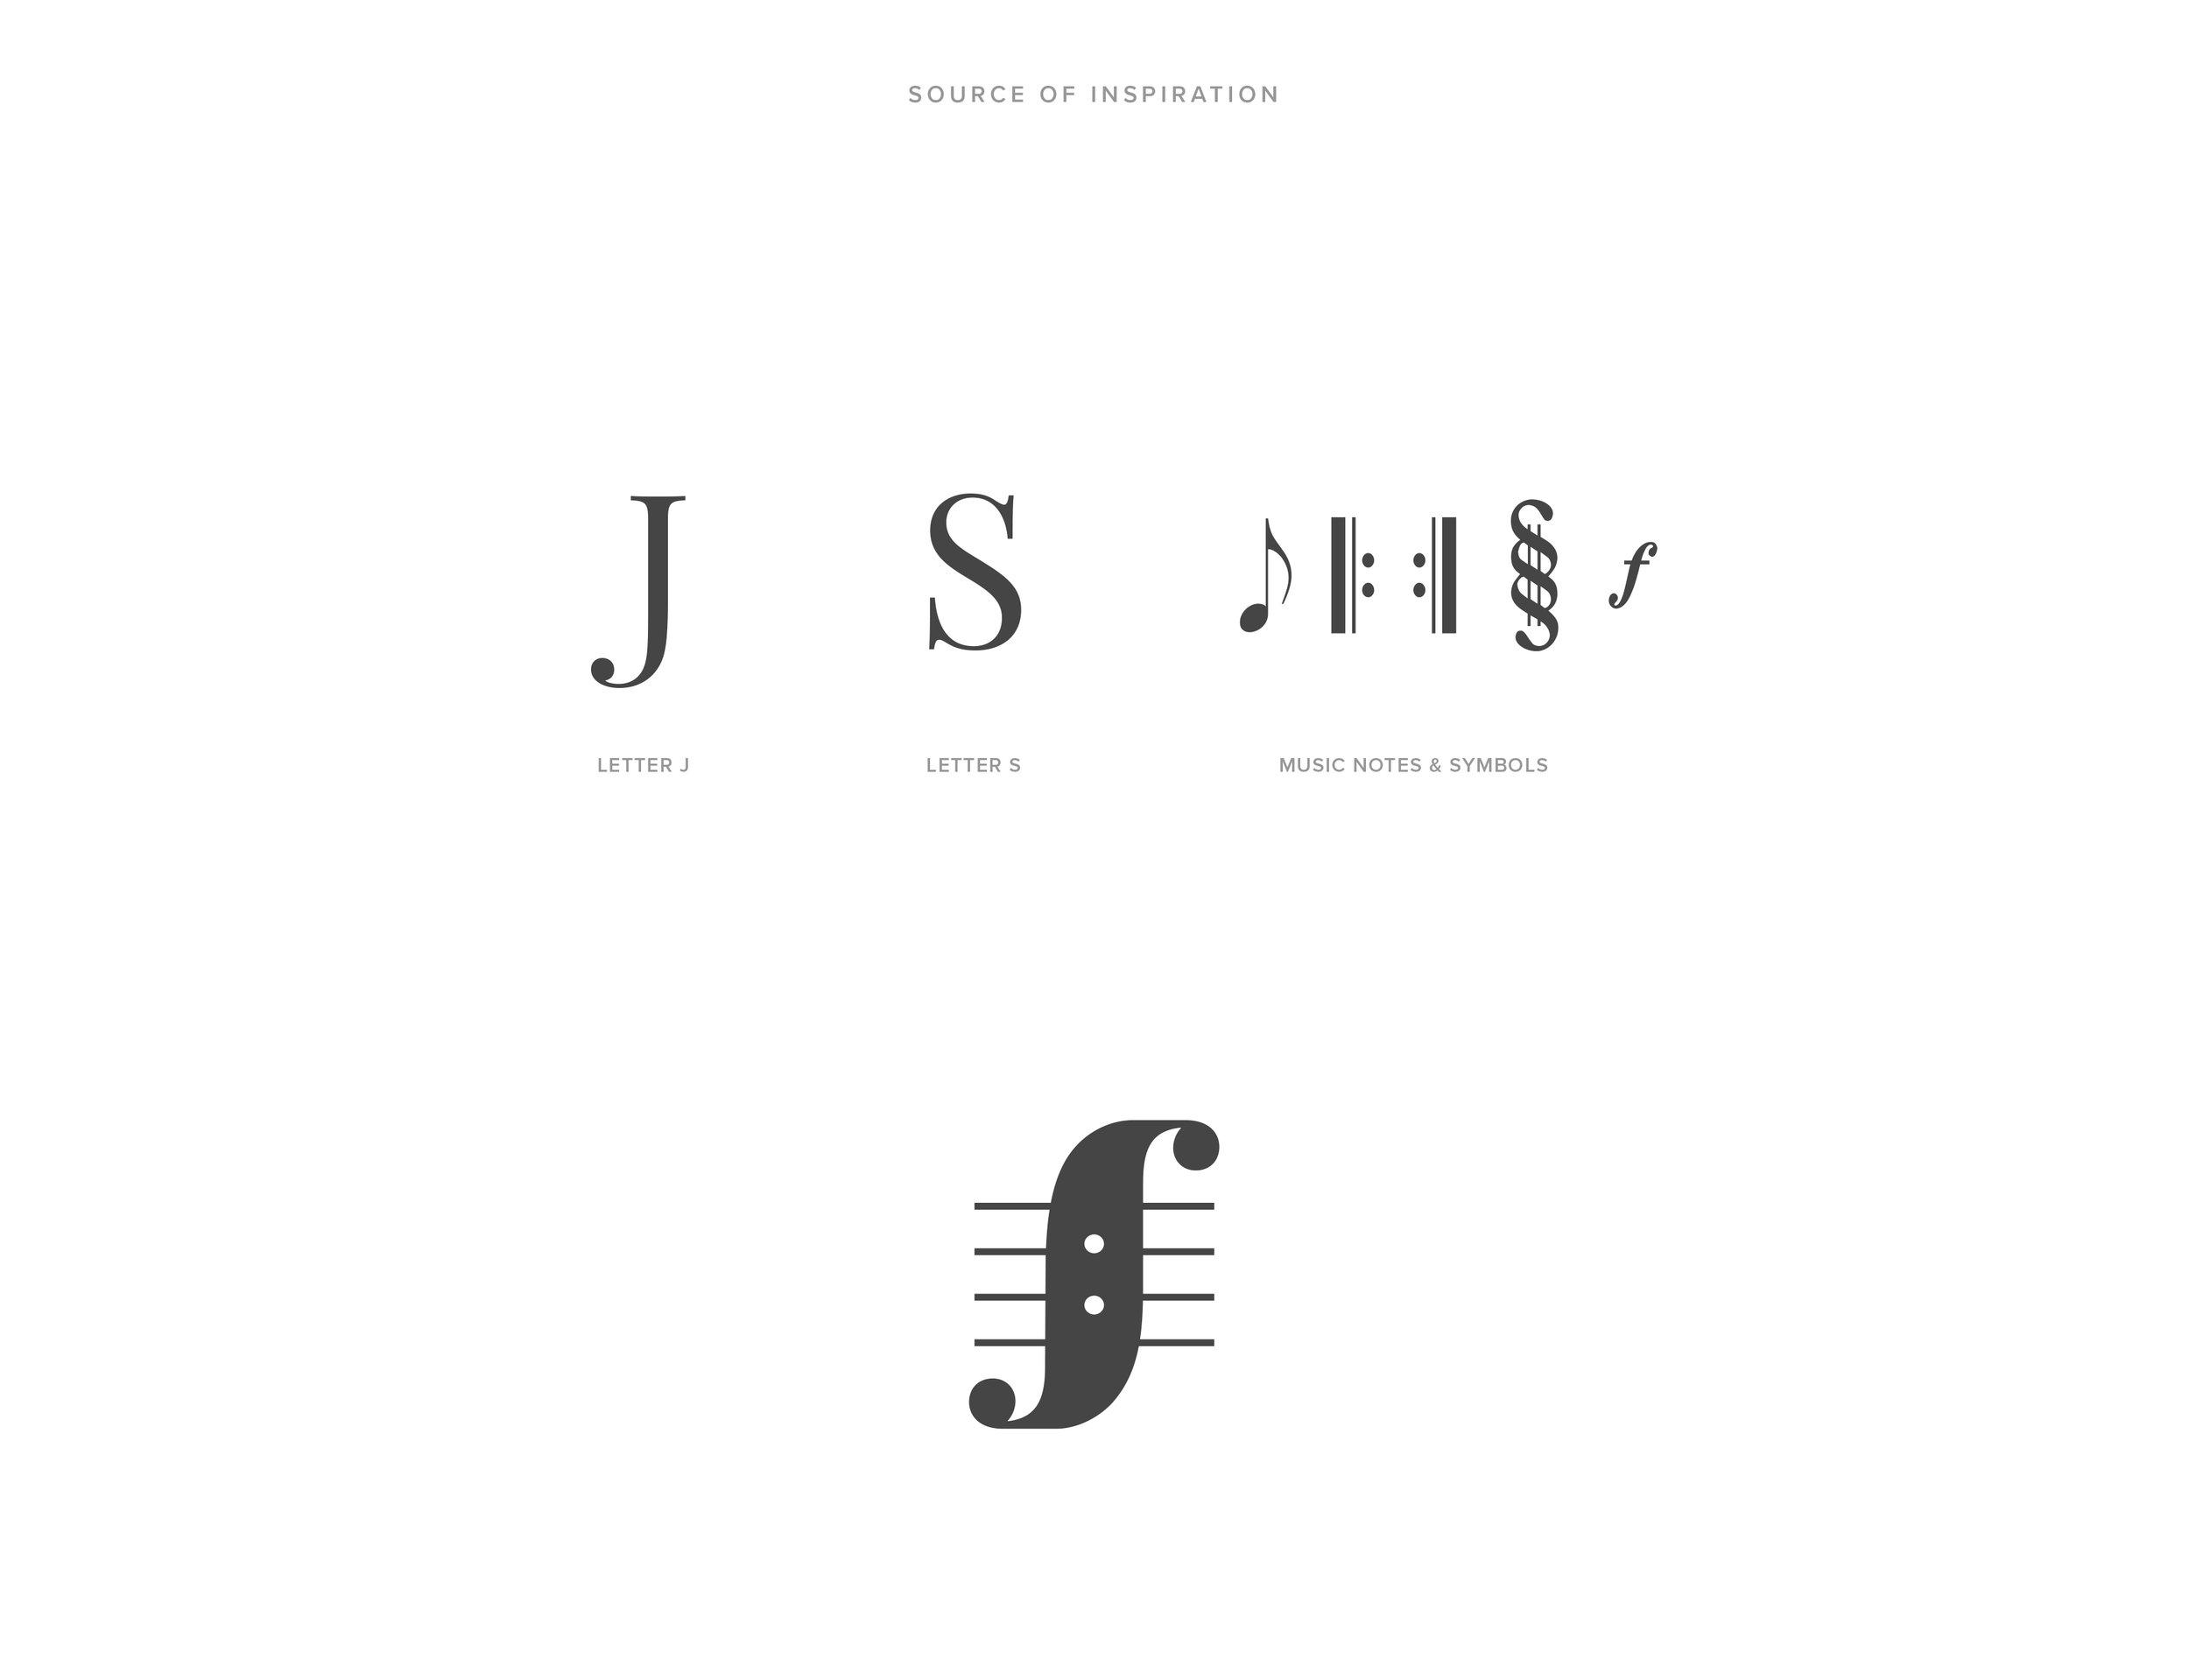 judy-stakee-brand-identity-06.jpg